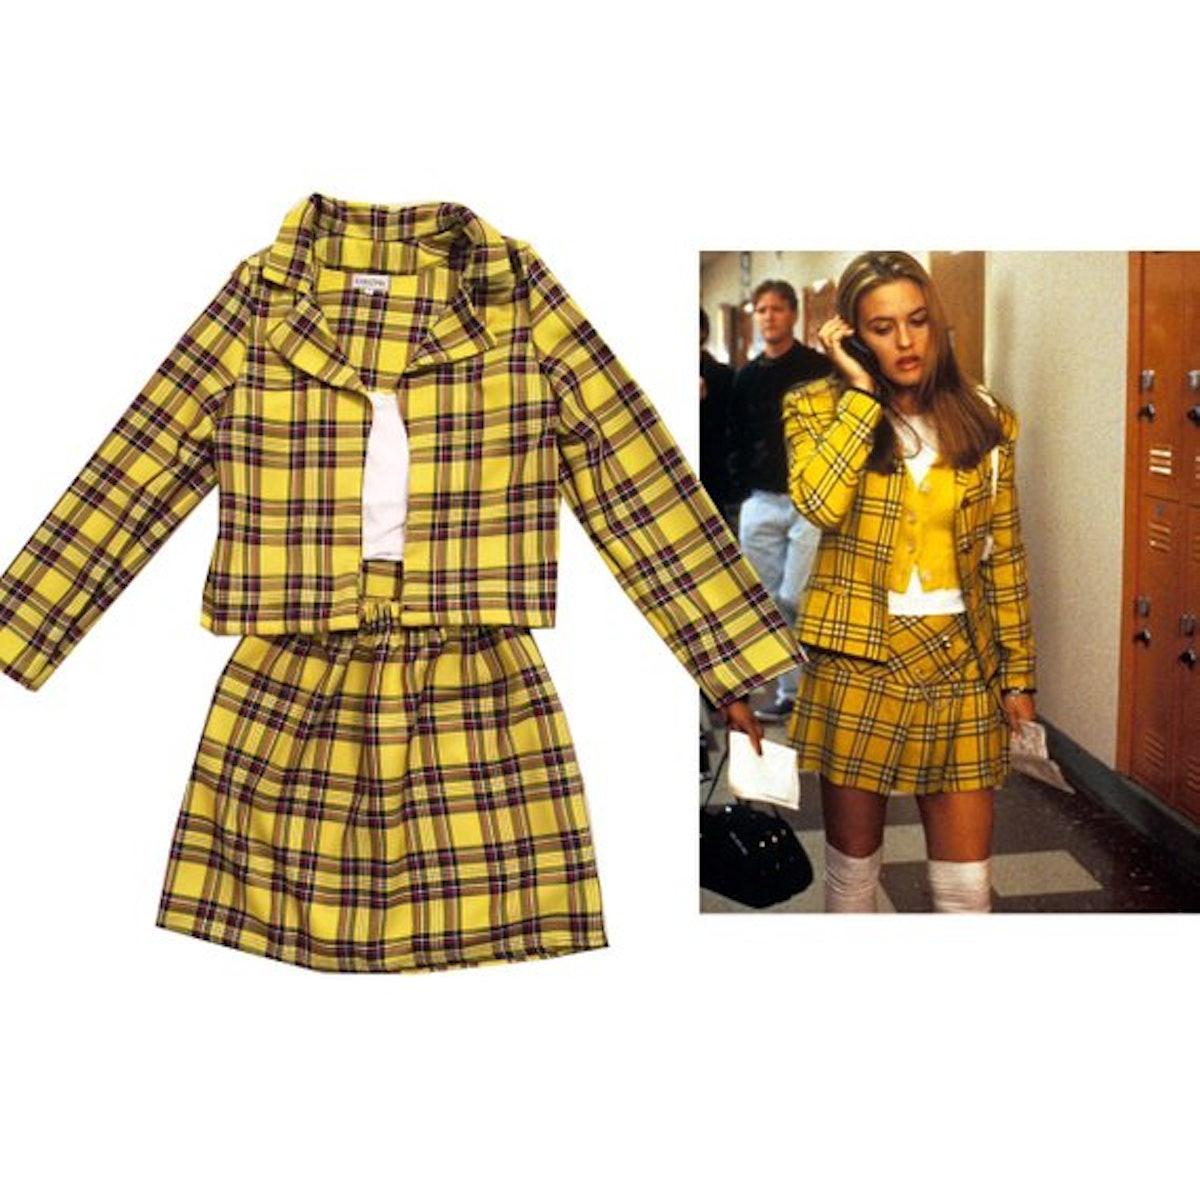 "Cher from ""Clueless"" Yellow Tartan Plaid Costume"